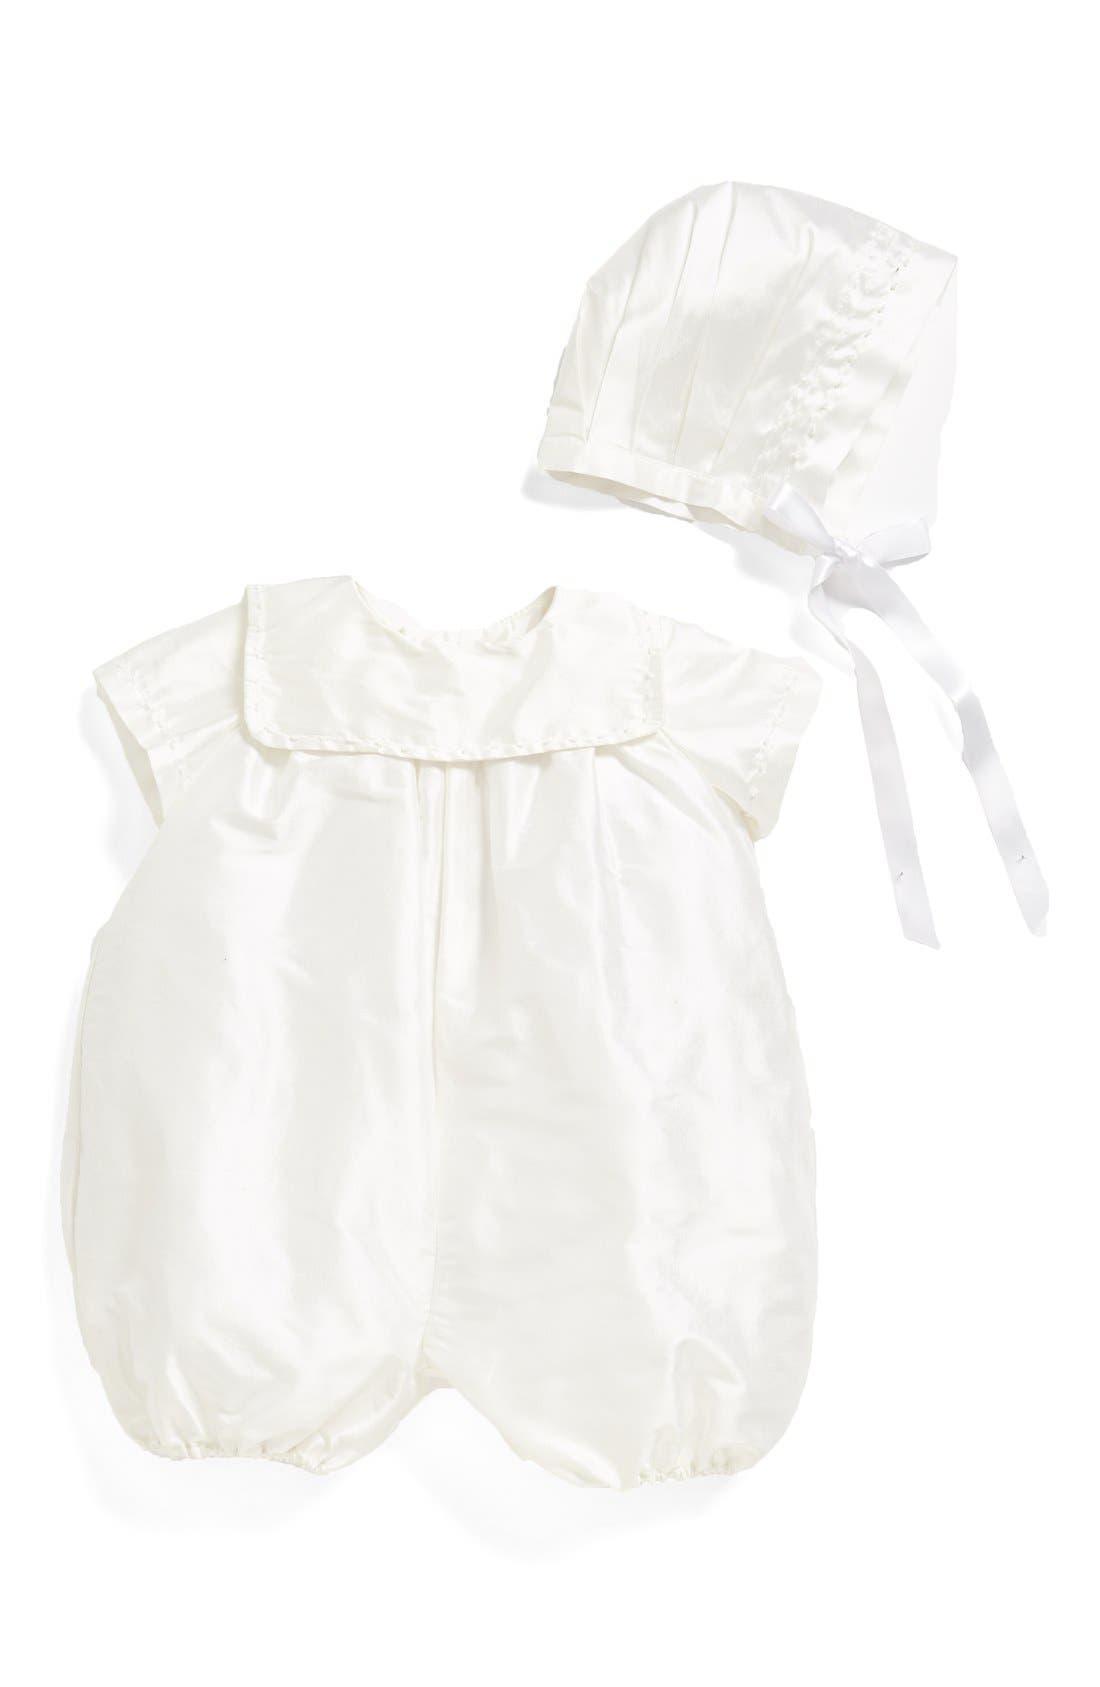 'Charming' Silk Romper & Bonnet,                         Main,                         color, WHITE